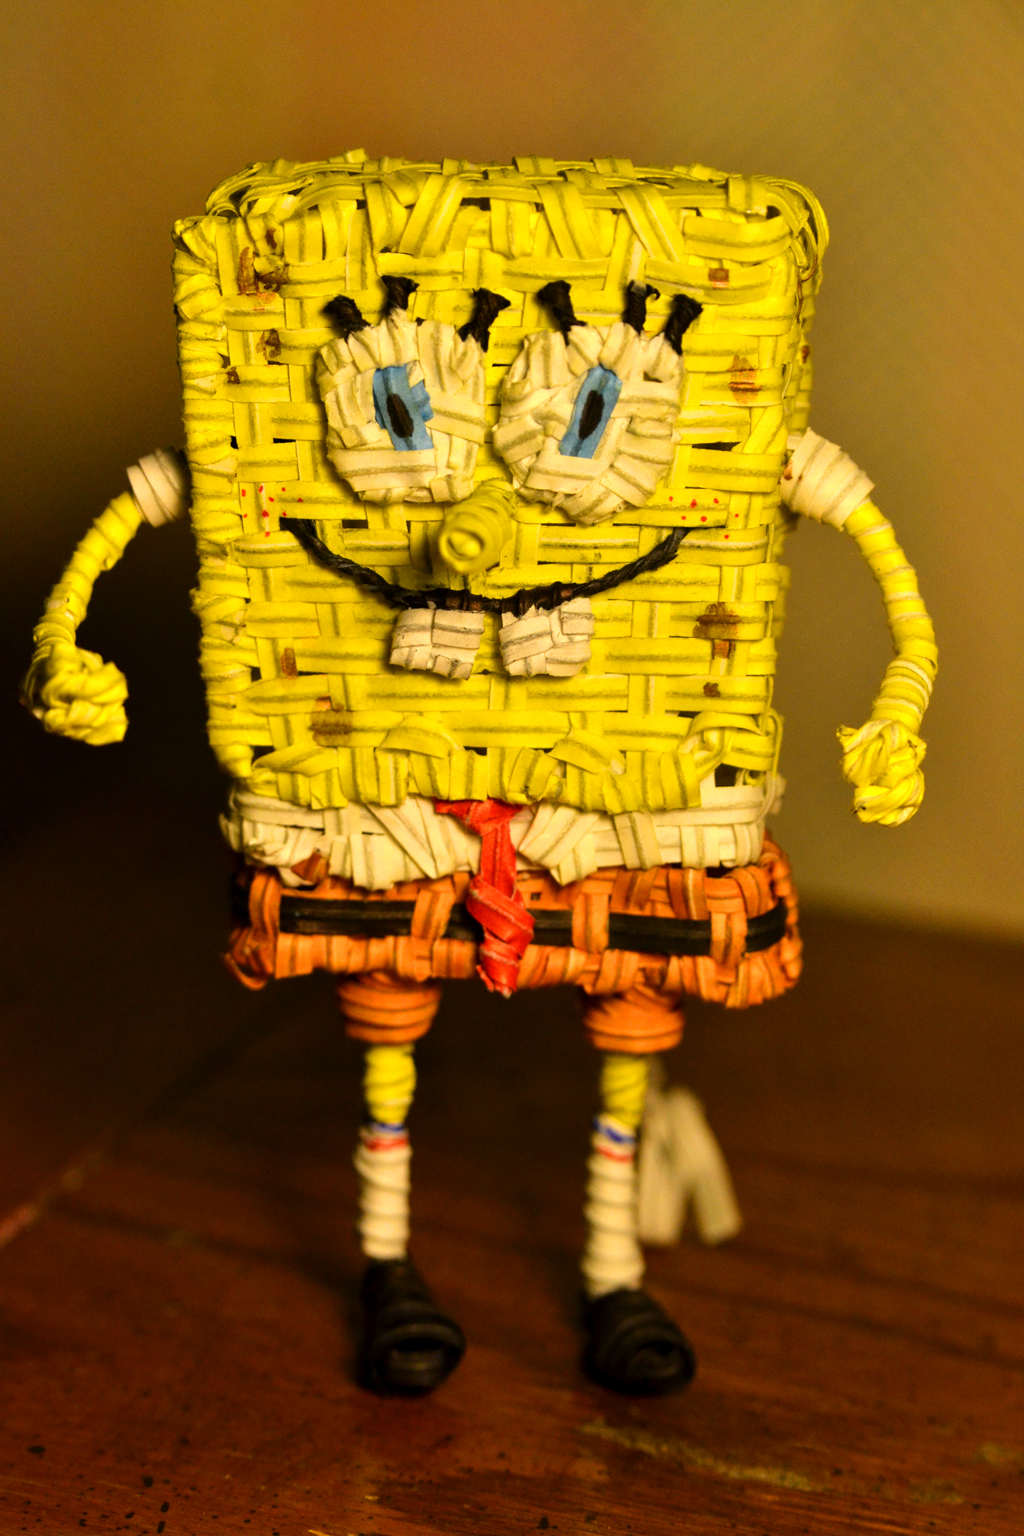 Spongebob (Twisttie) Squarepants by justjake54